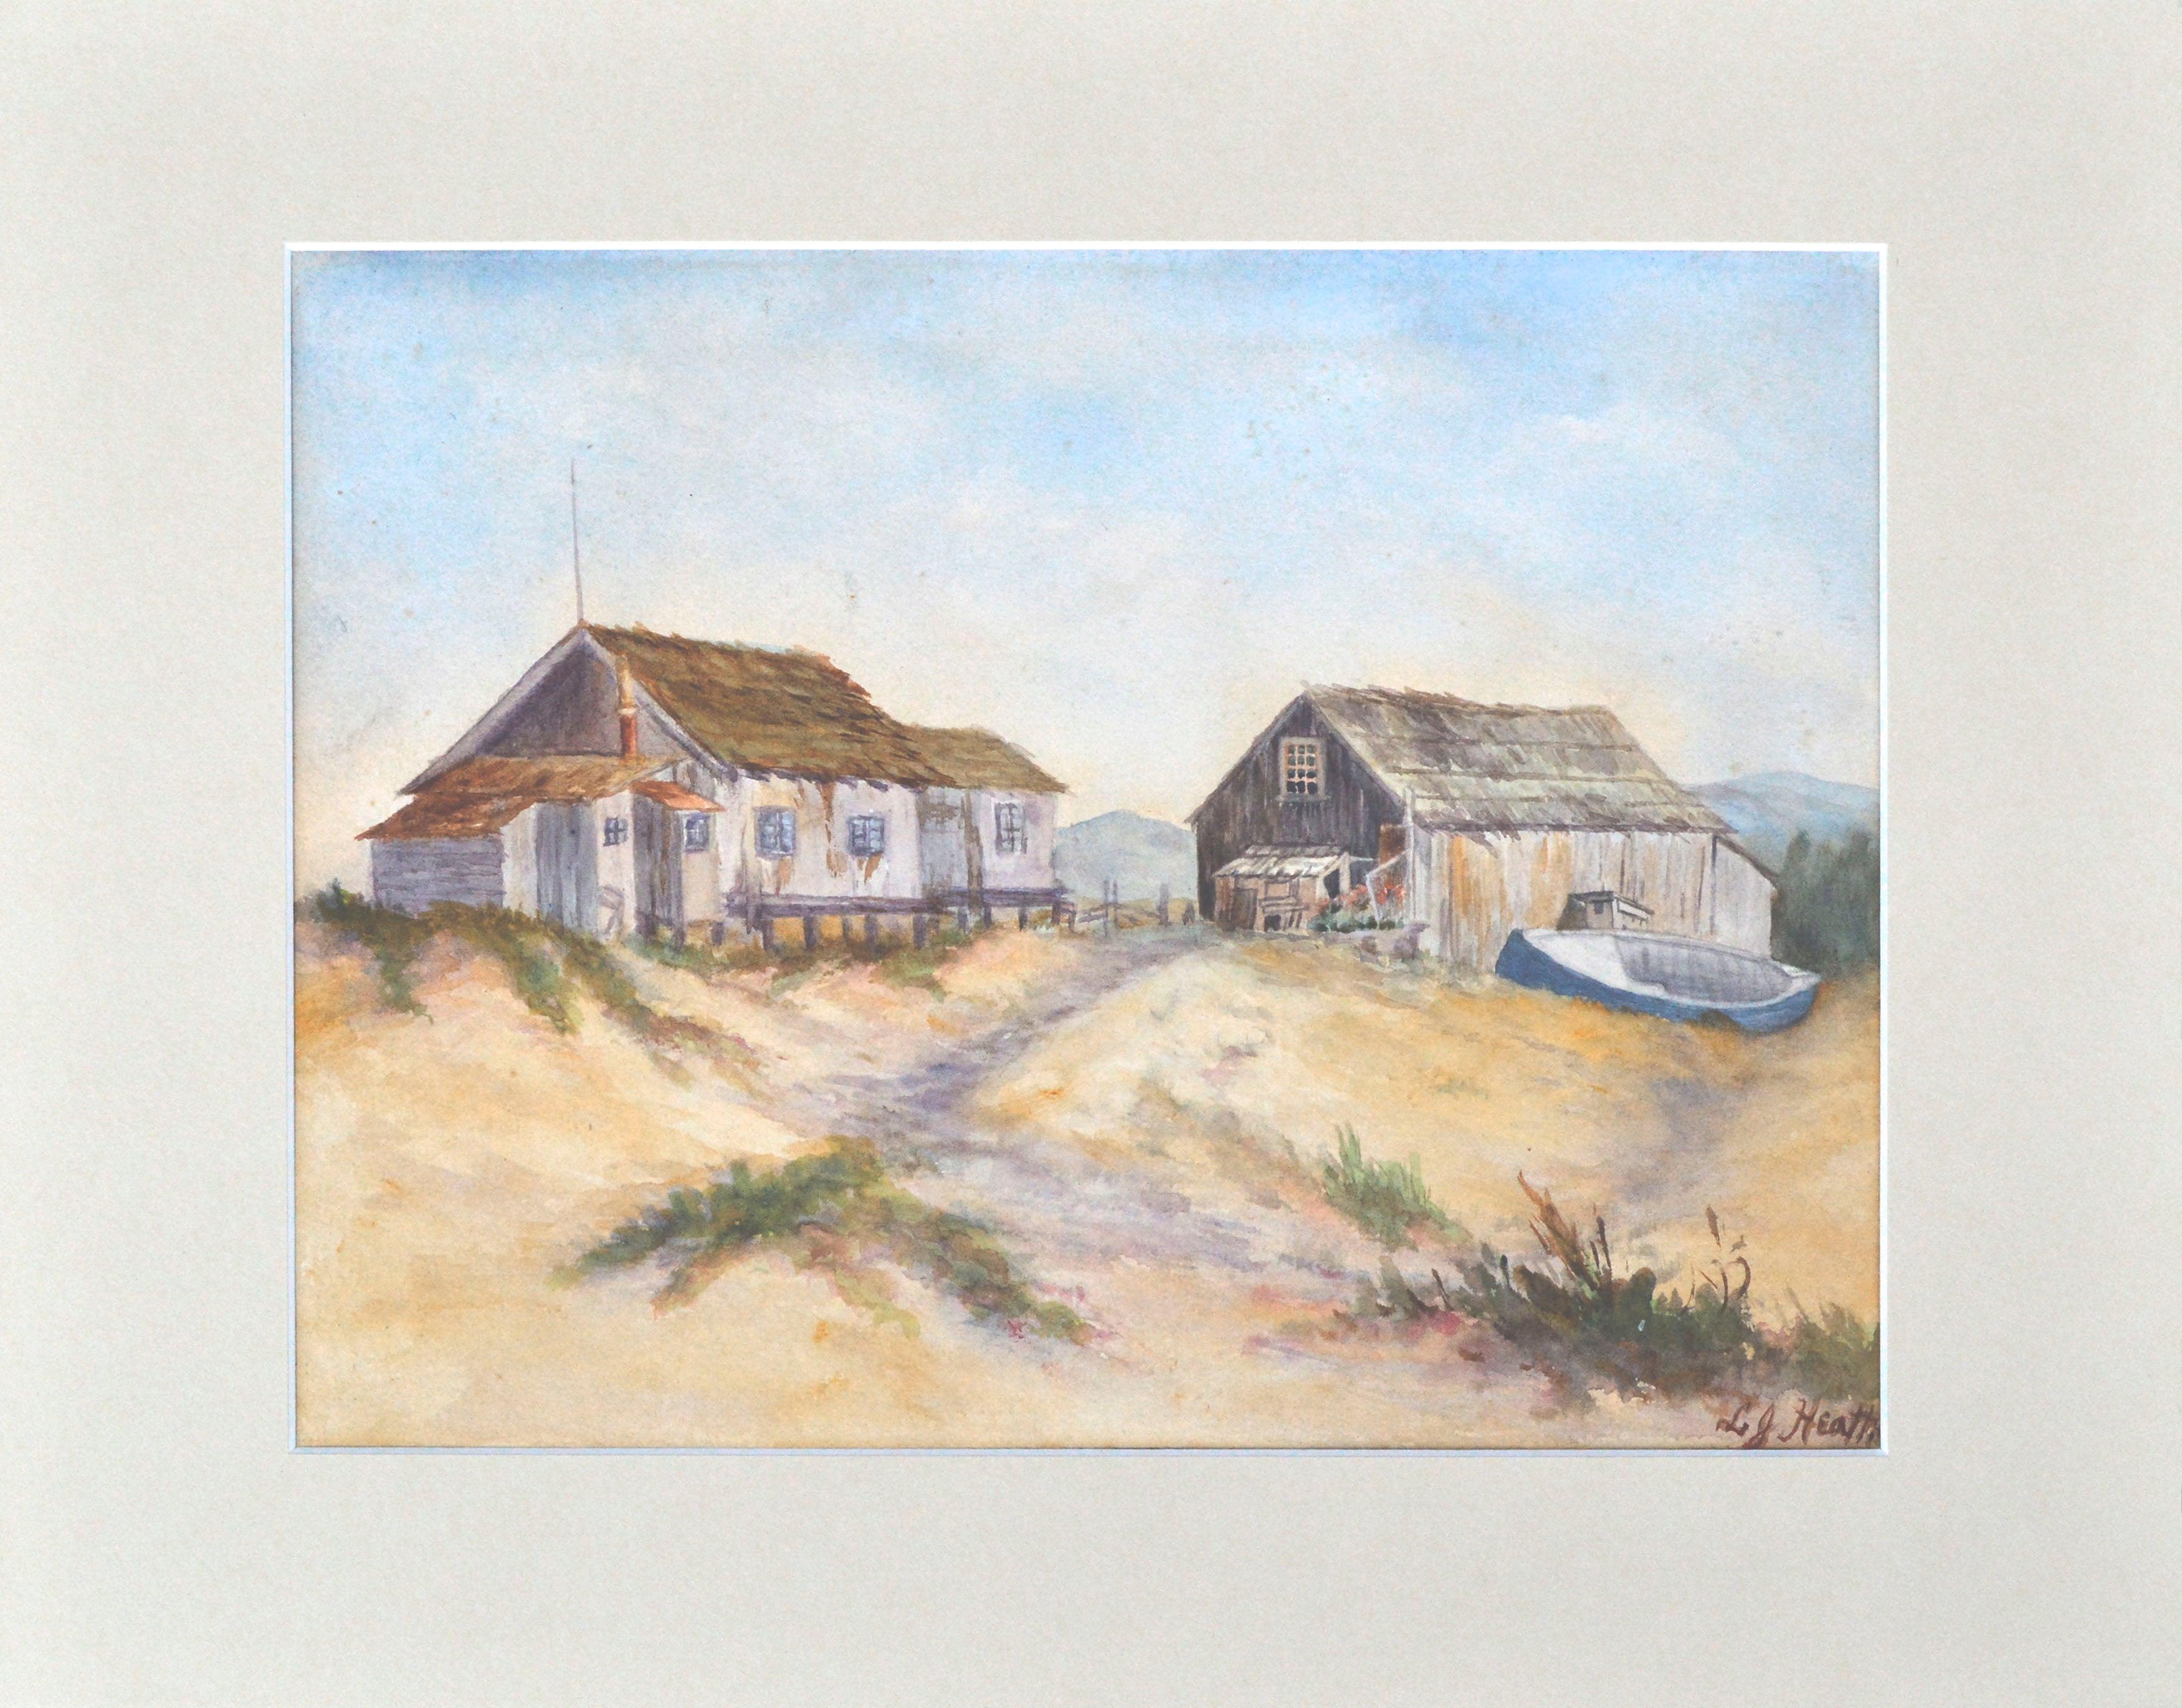 Old Davenport Whaling Village A Whaler's Cottage,  by Lilian Jackson Heath